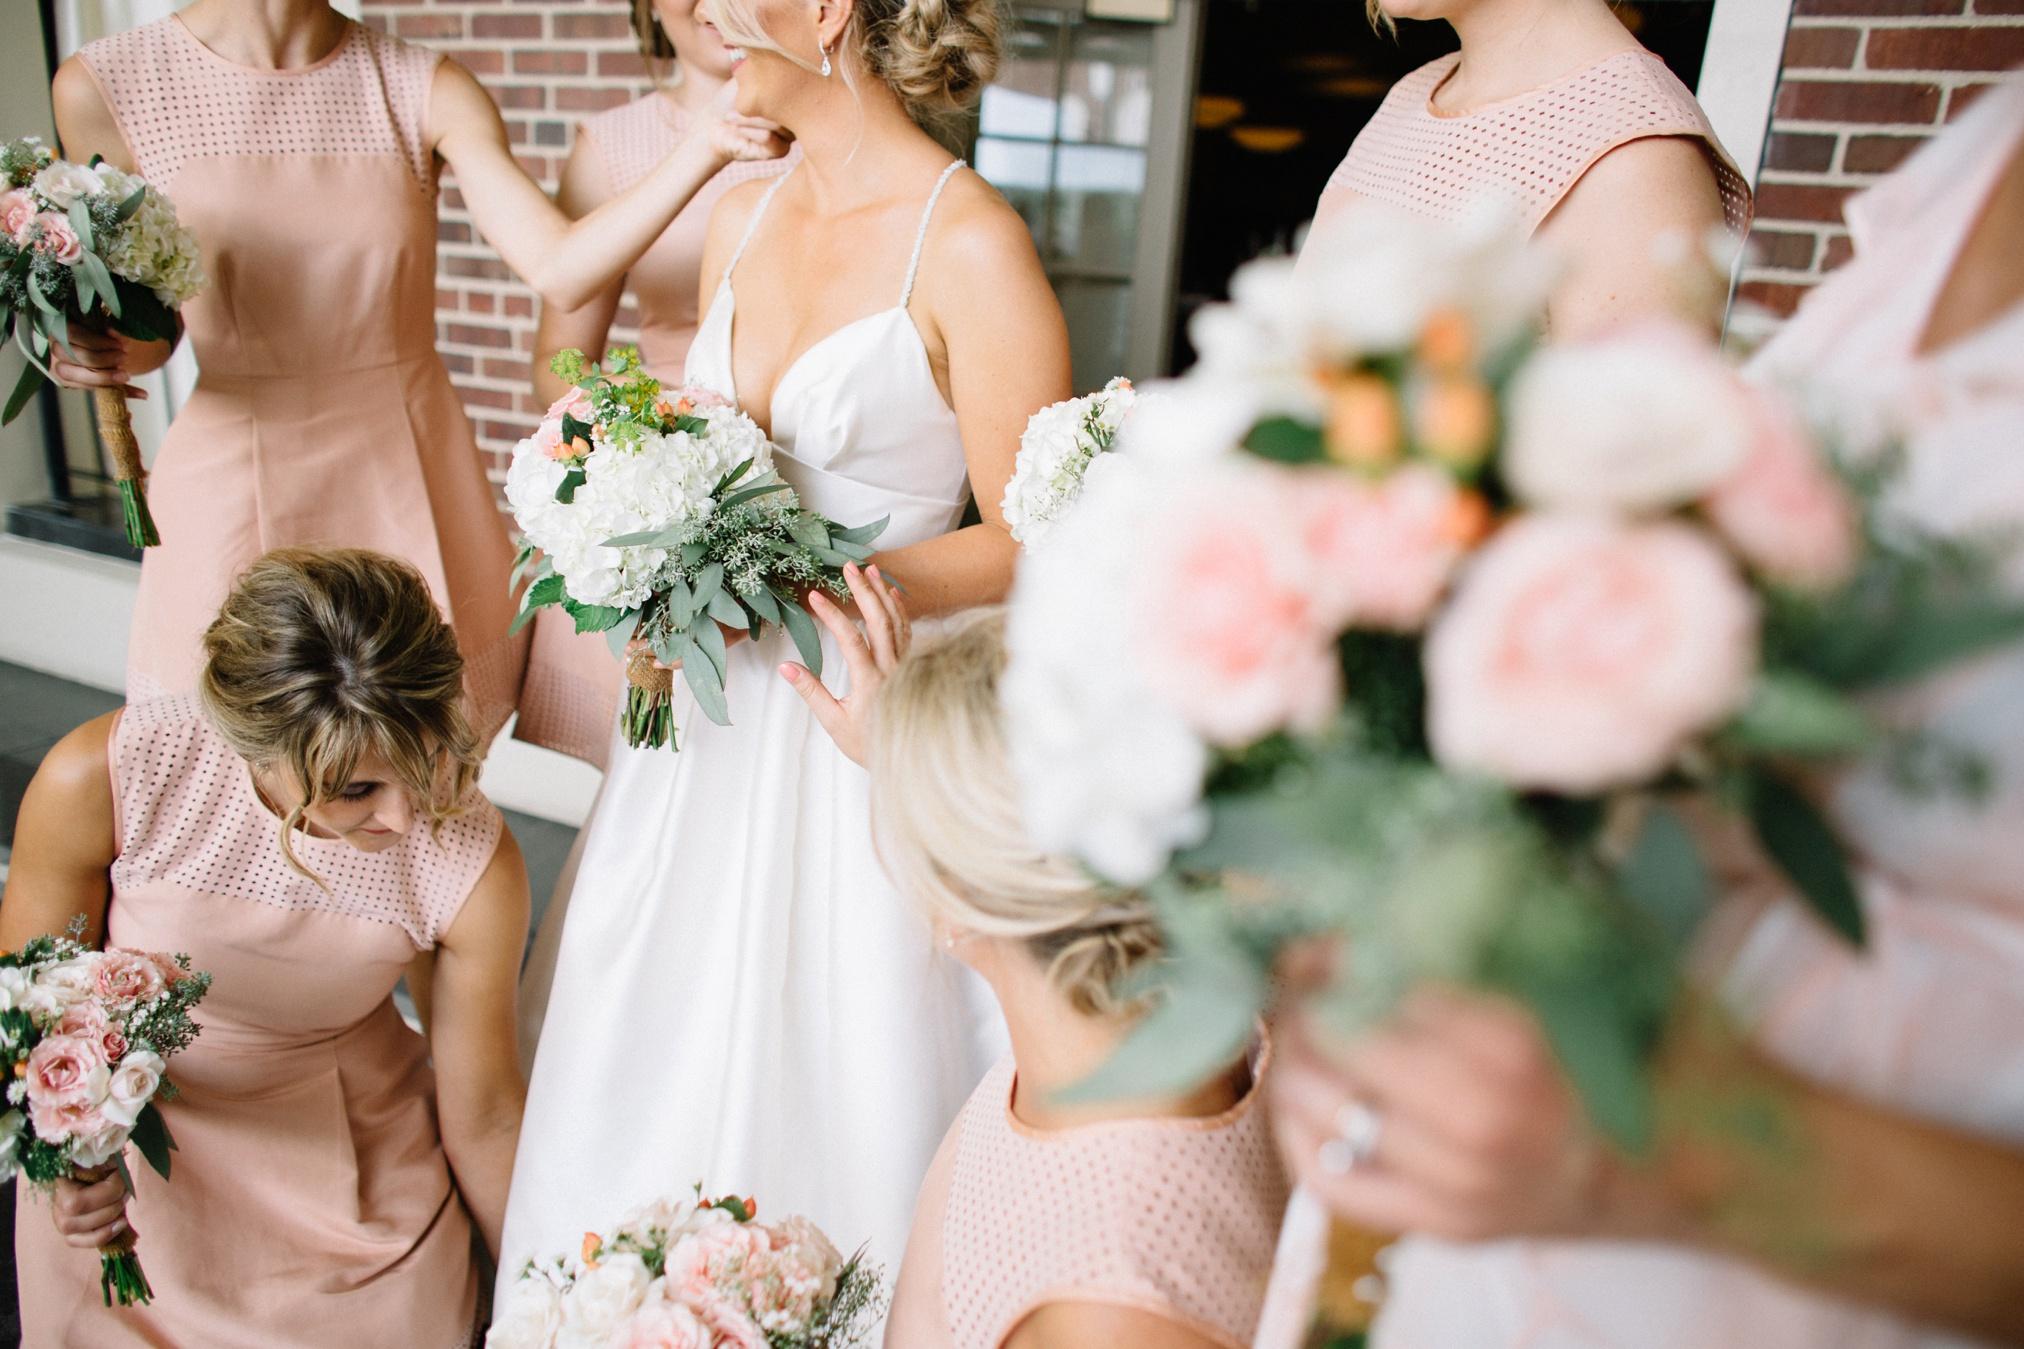 brenna+michael_wedding-147.jpg